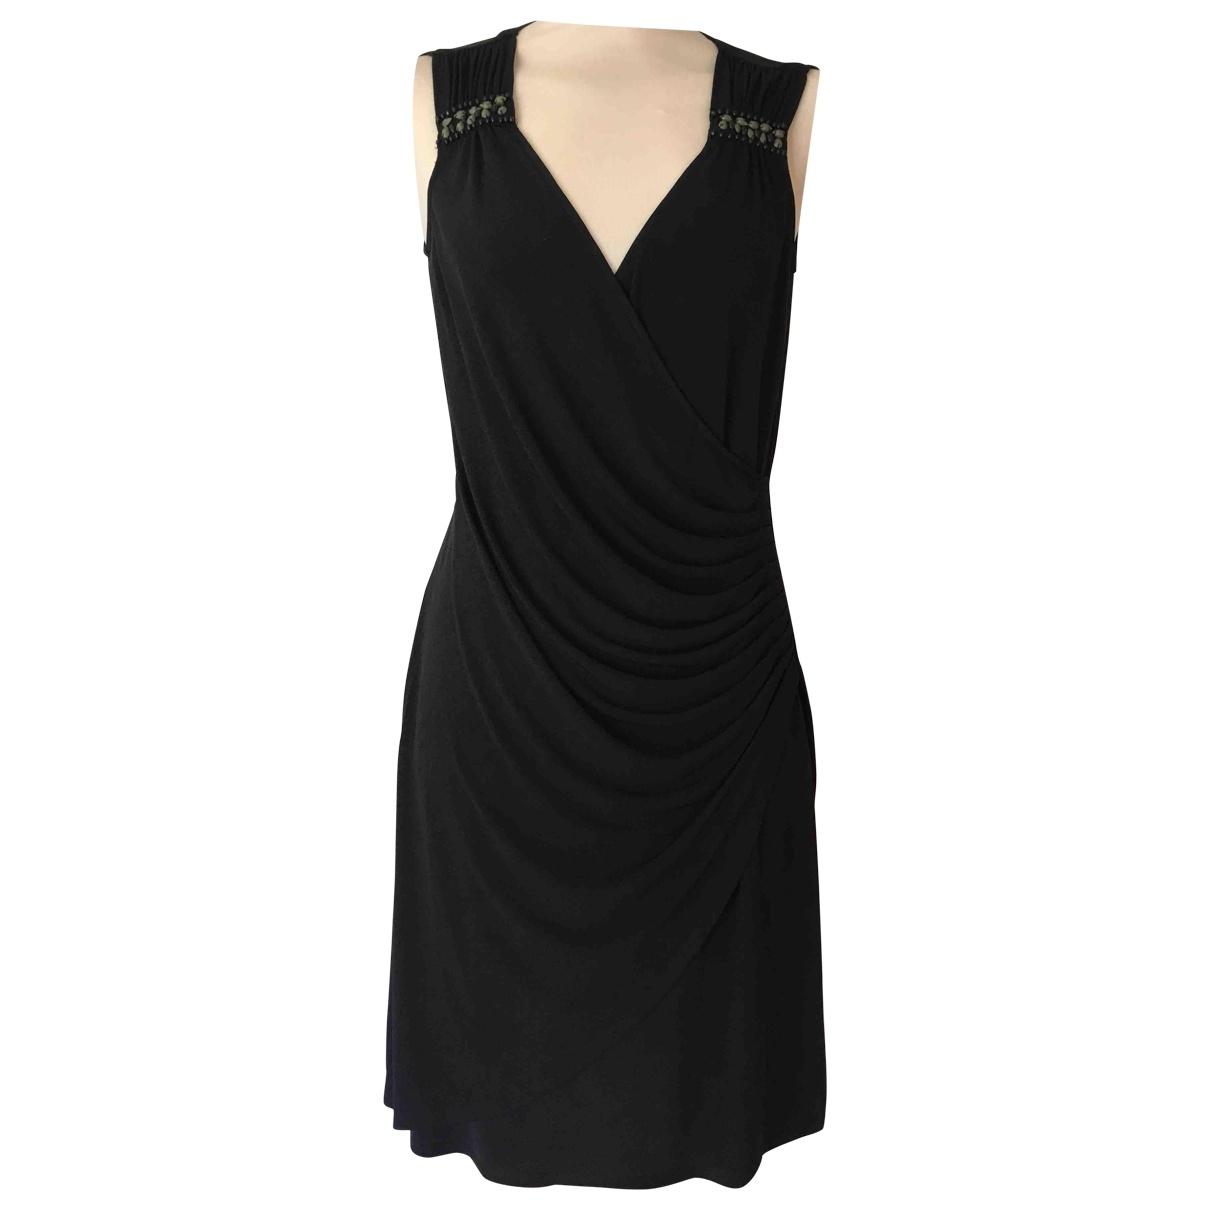 Hale Bob \N Kleid in  Schwarz Polyester